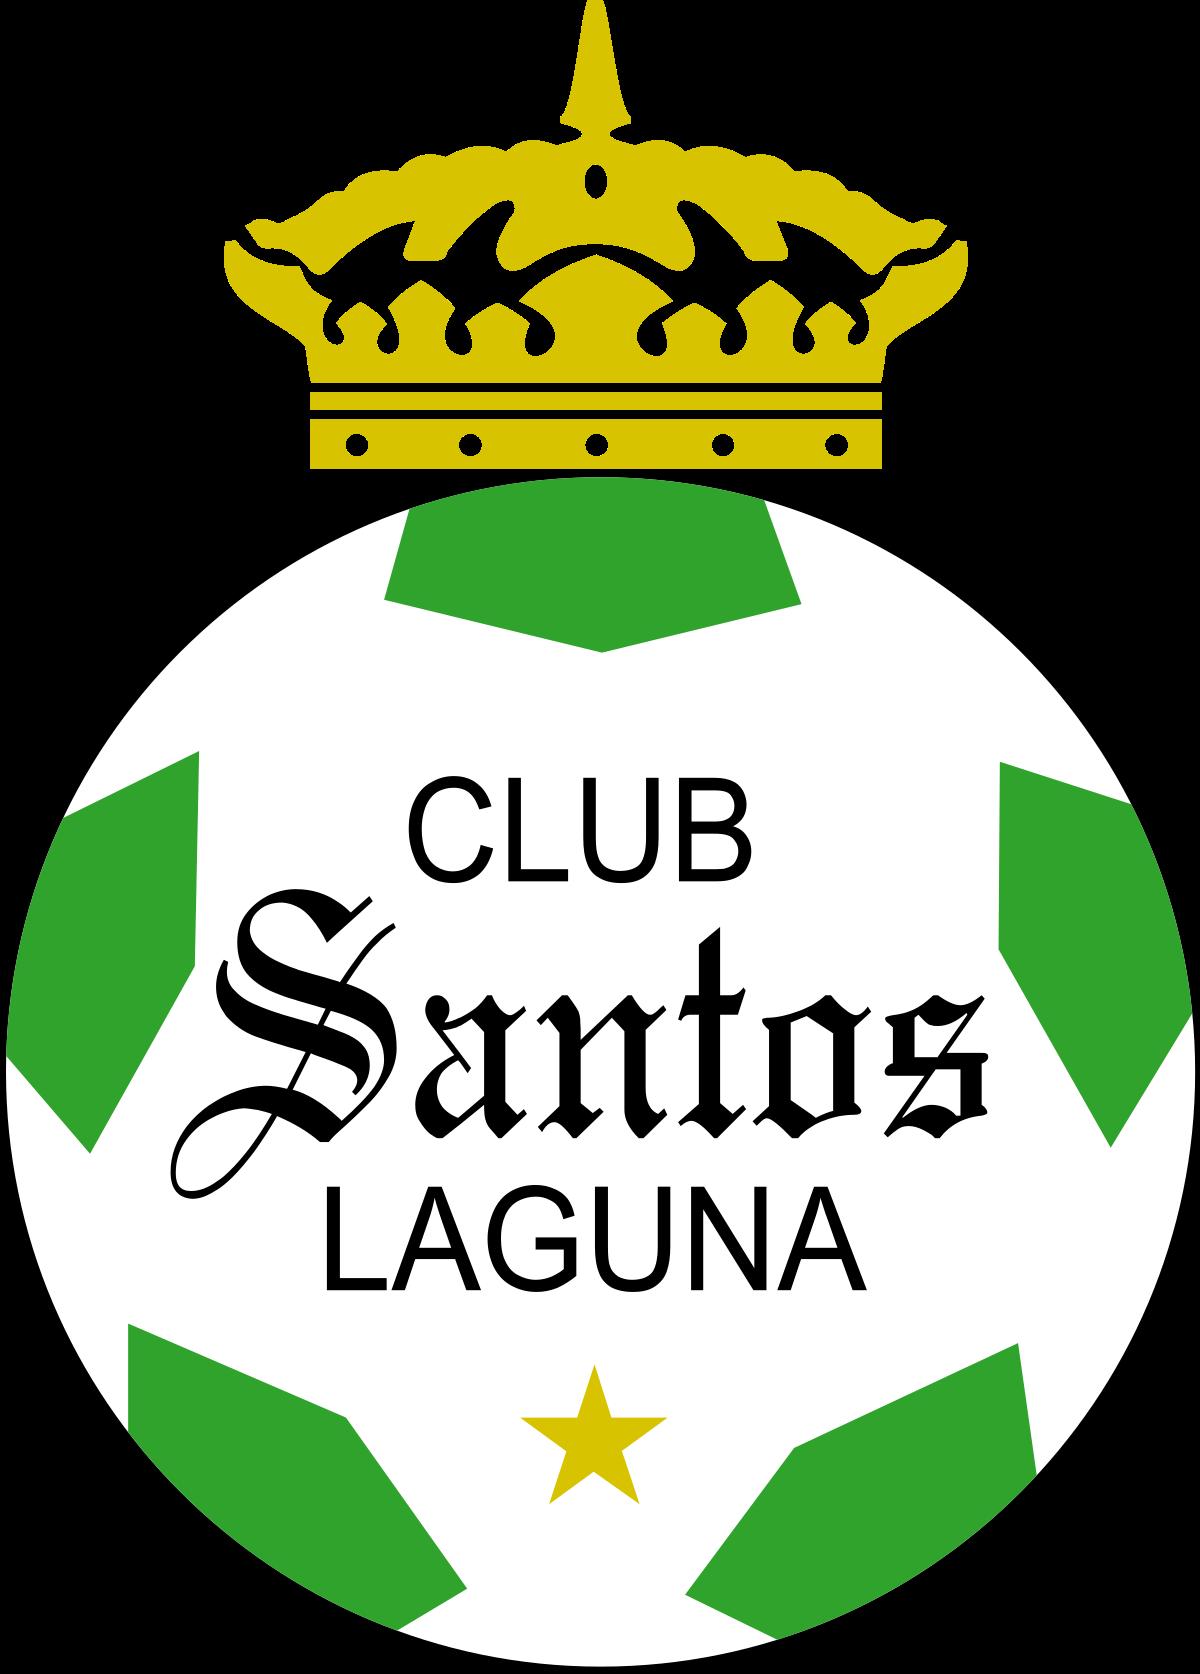 Santos laguna clipart clip art Santos Laguna – Wikipedia clip art